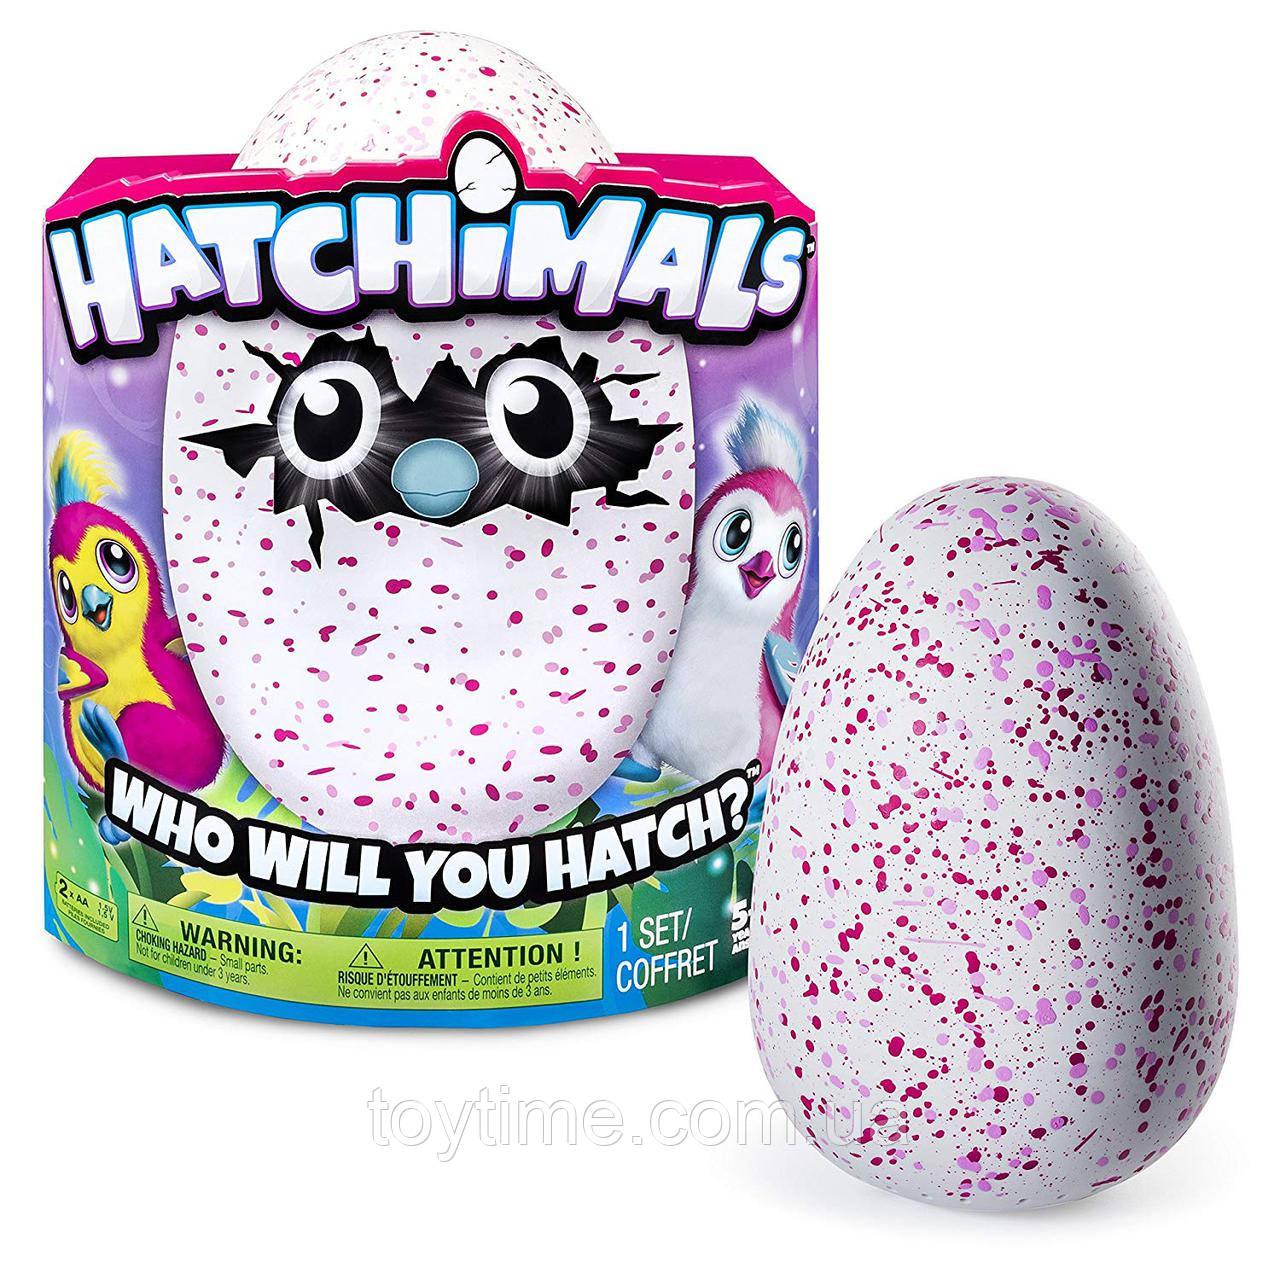 Хэтчималс Пингви (розовое яйцо) / Hatchimals Hatching Egg Interactive Creature Penguala